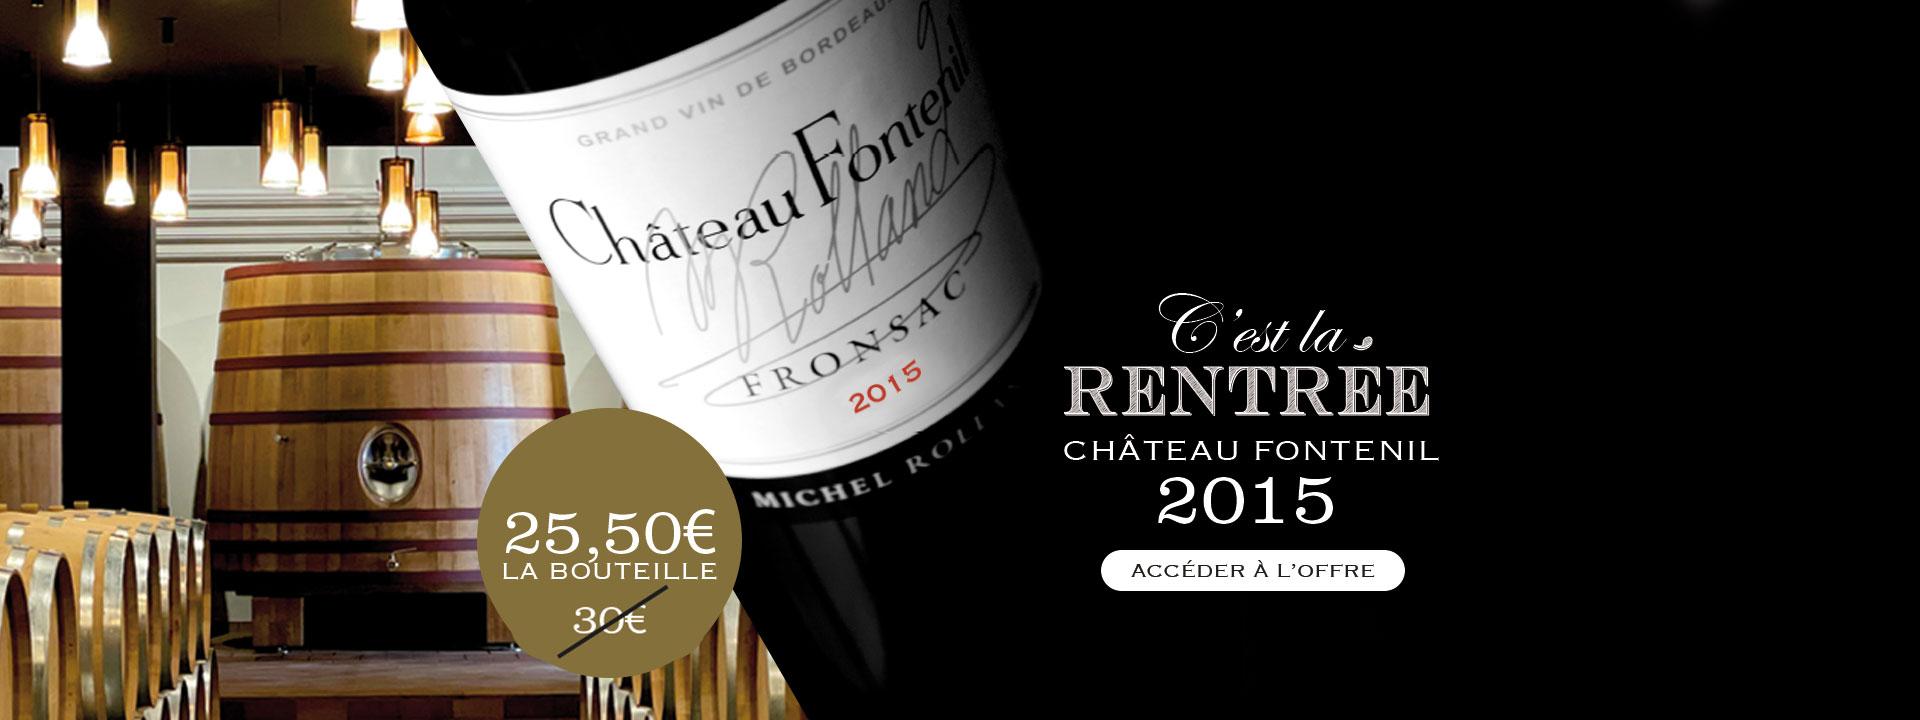 Château Fontenil 2011 - Rolland Collection